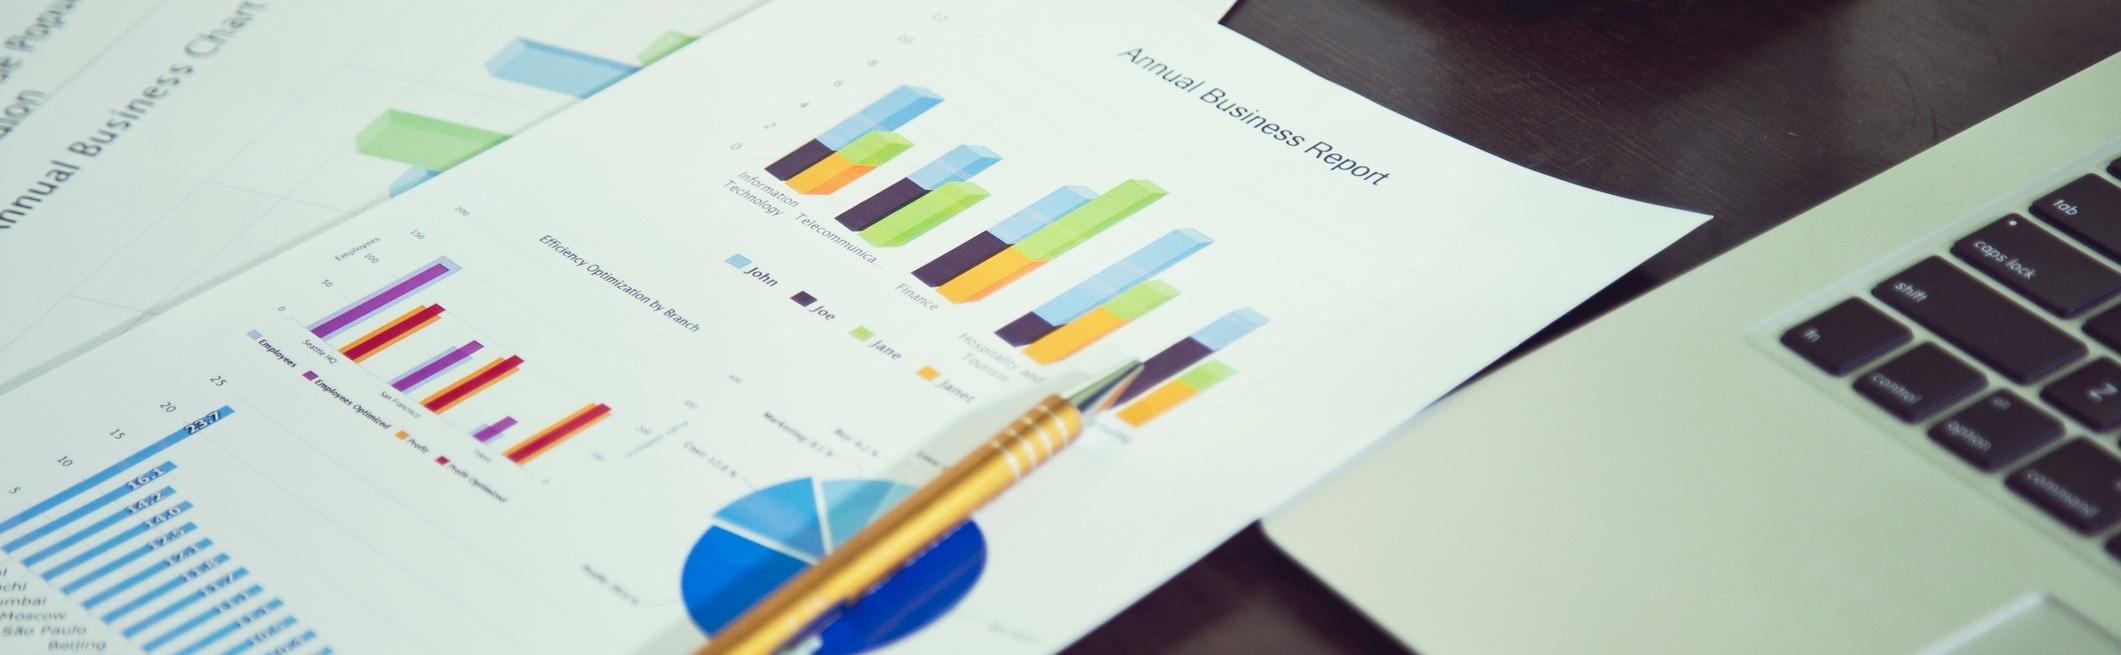 Data Analysis and Reporting -